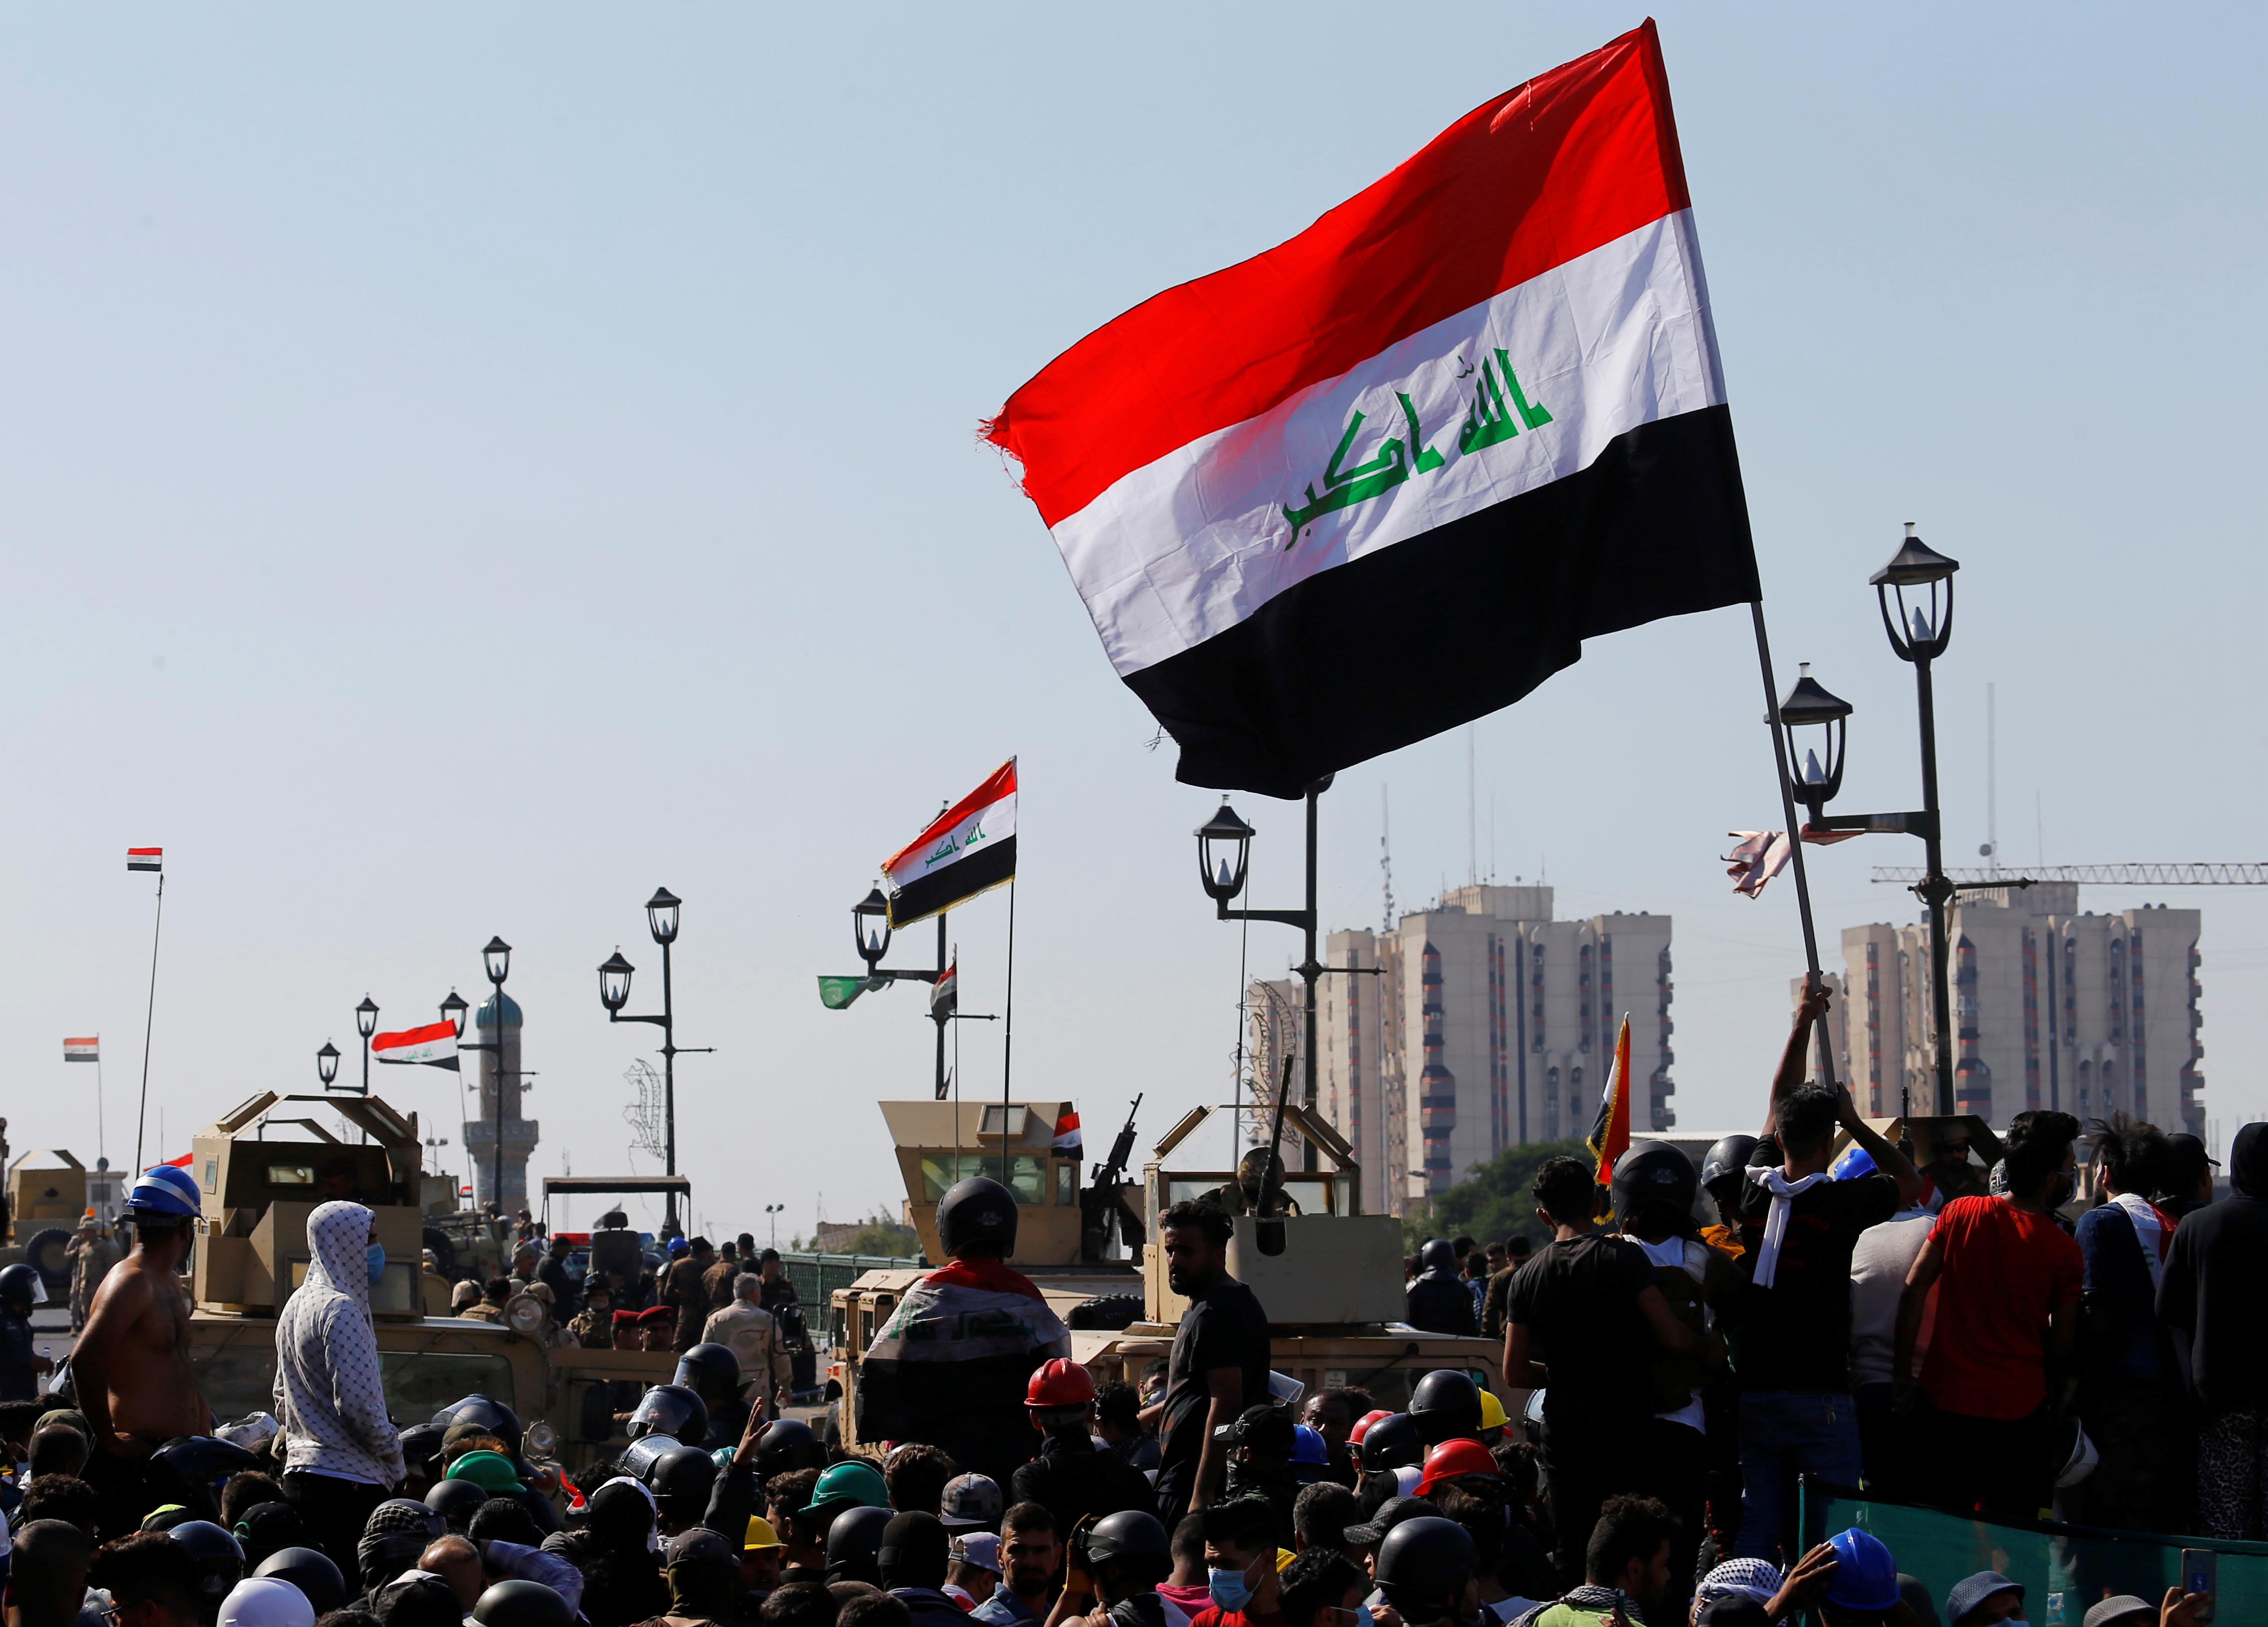 Iran Lebanon Relations